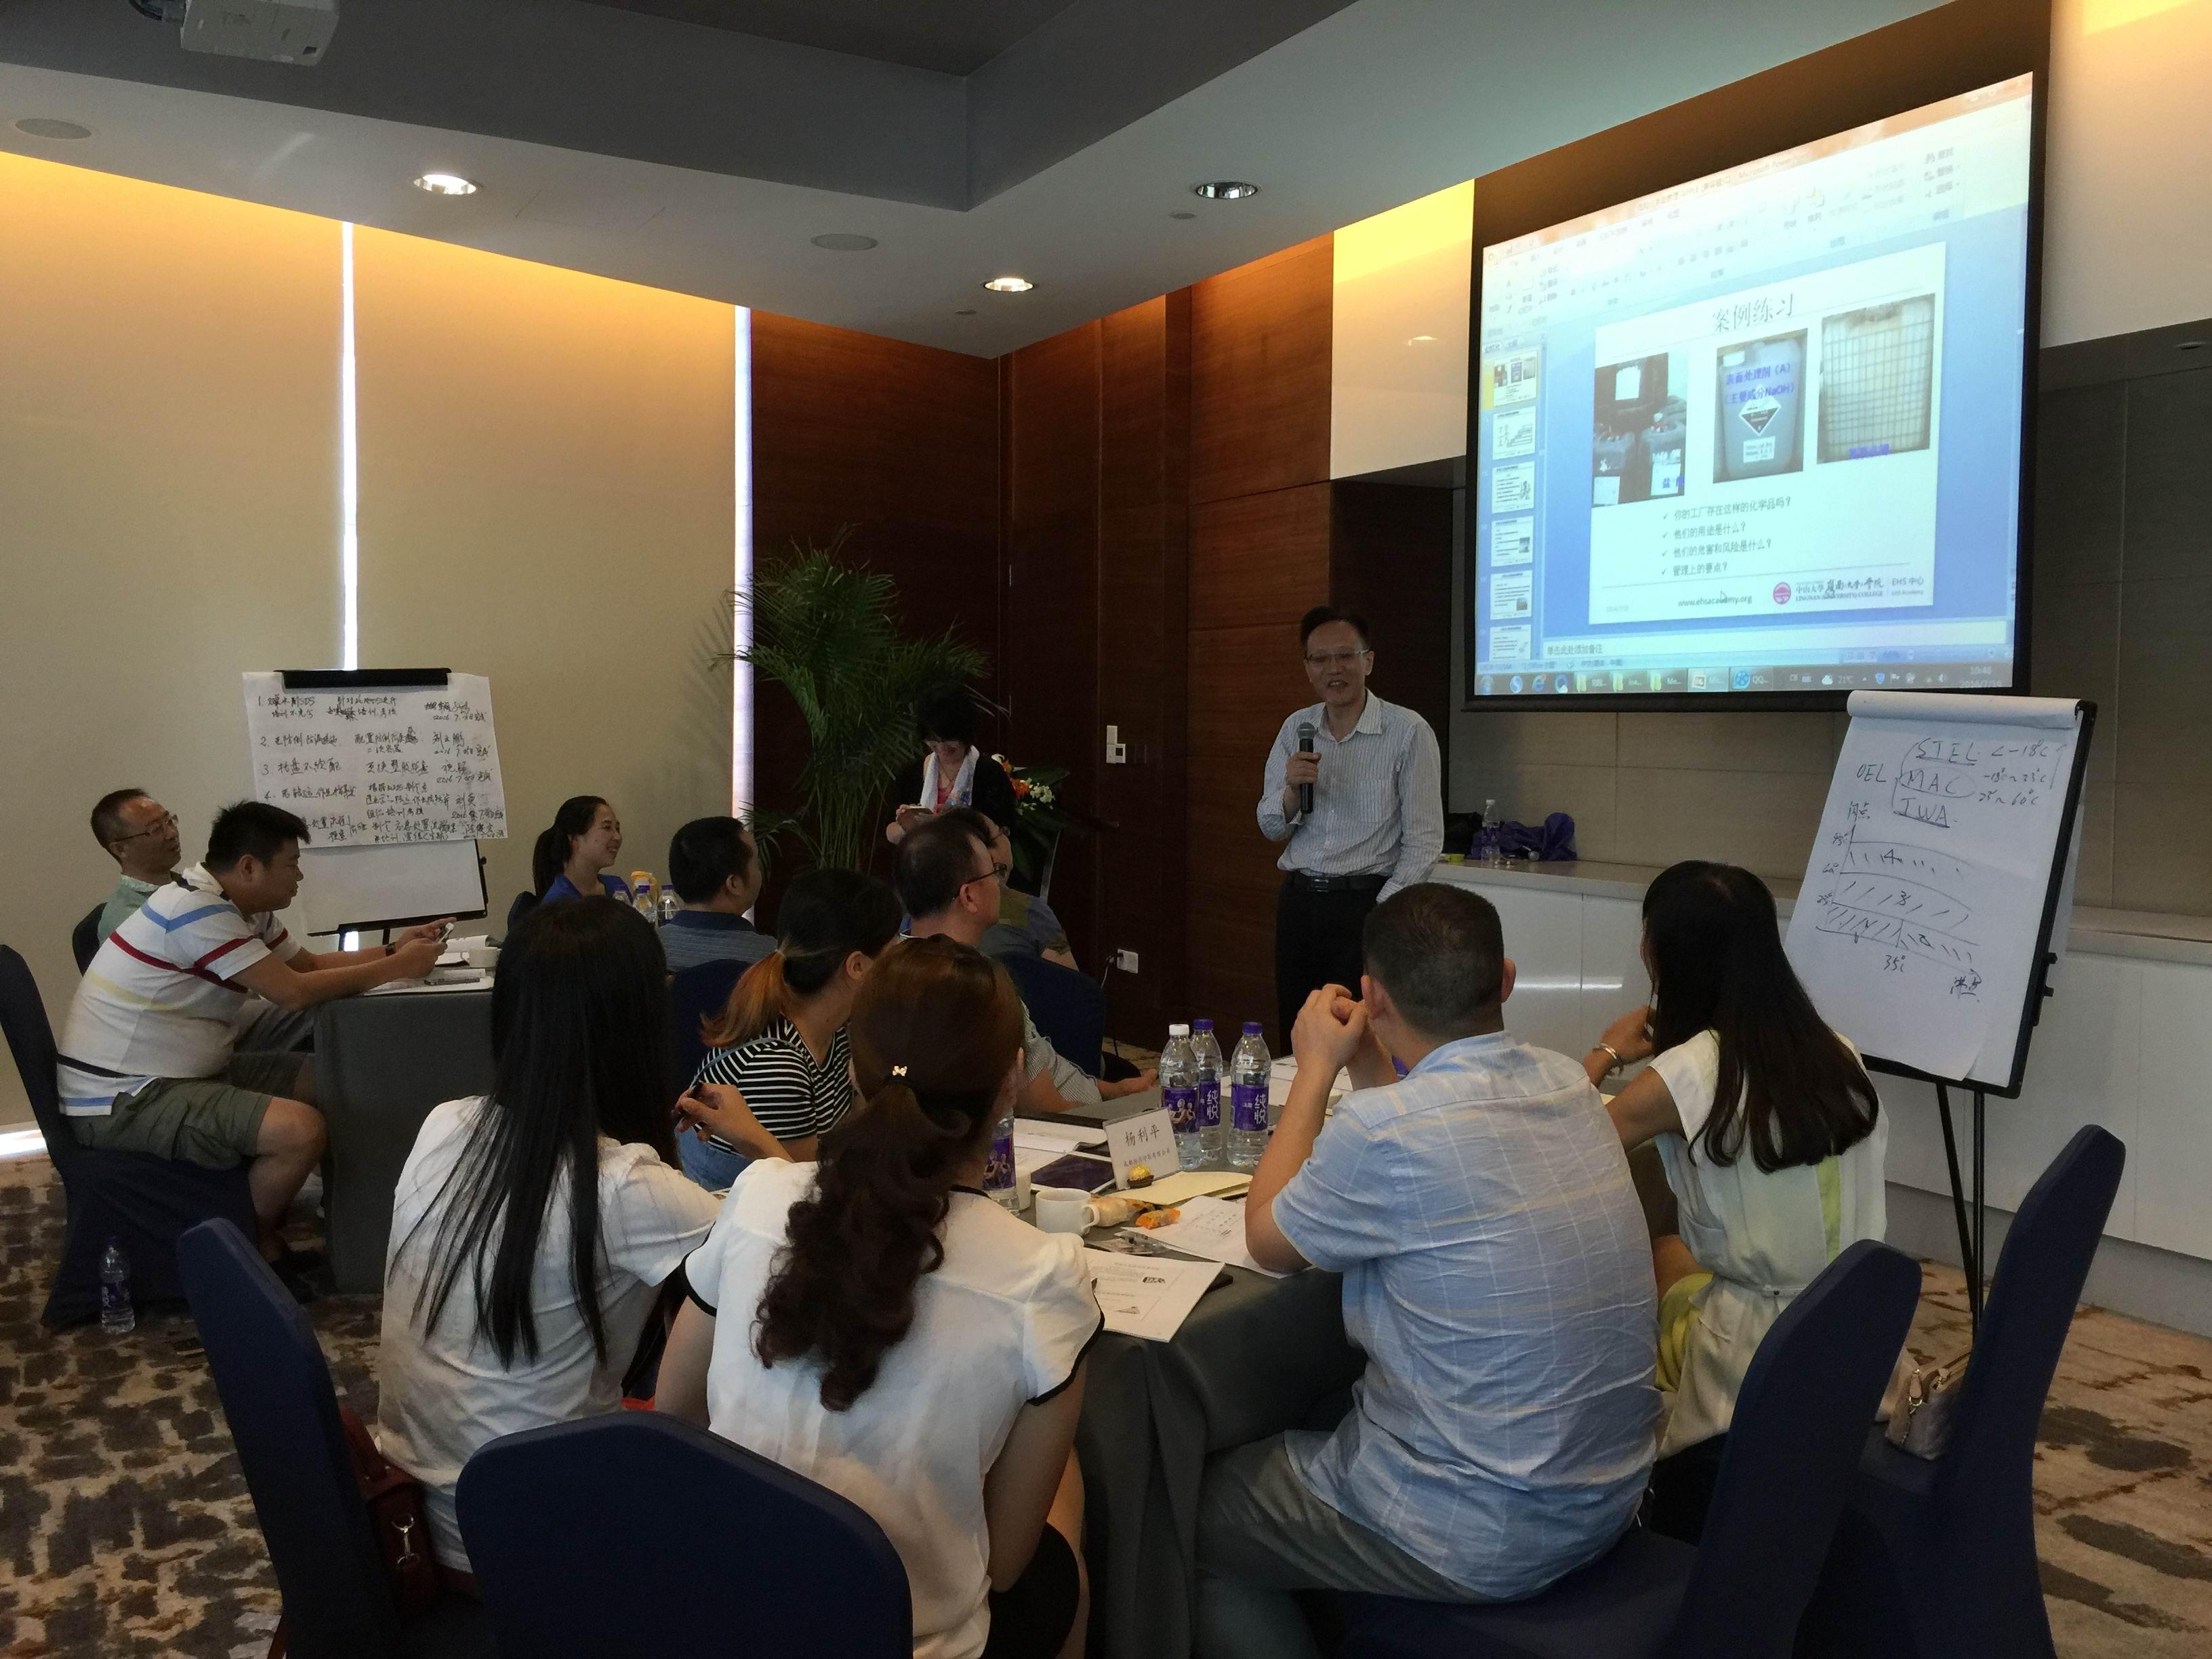 EHS中心负责人王晓晖教授出席苹果公司供应商成都EHS培训